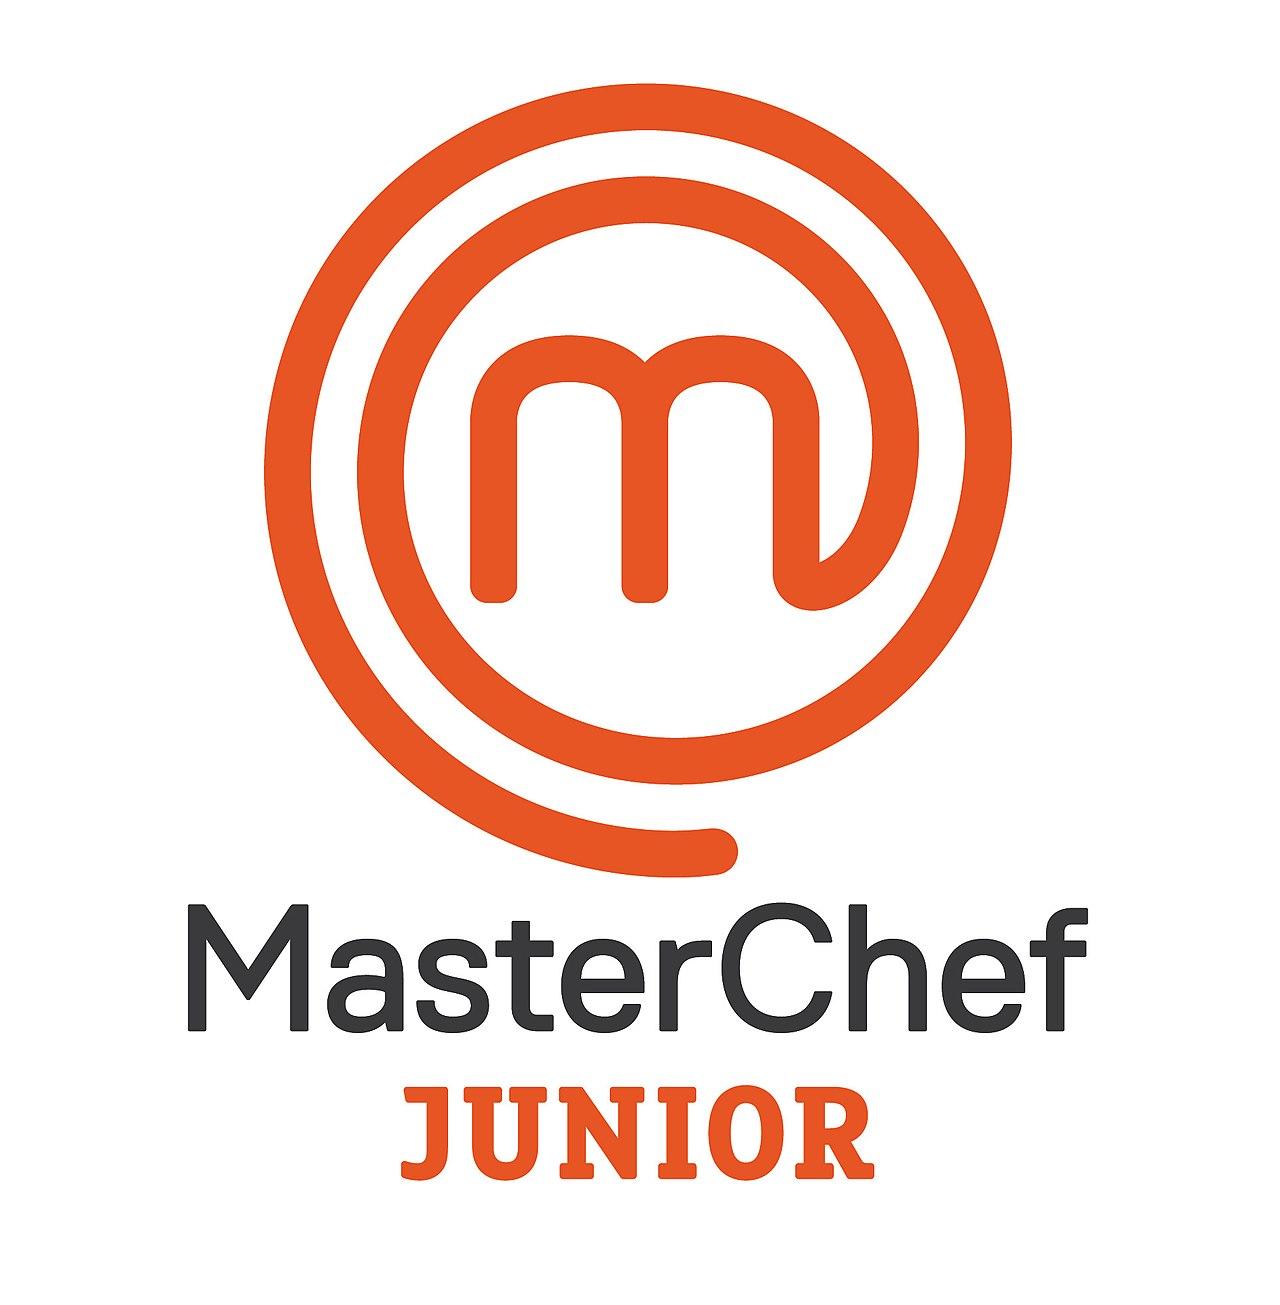 1280px-Masterchef-junior-logo.jpg